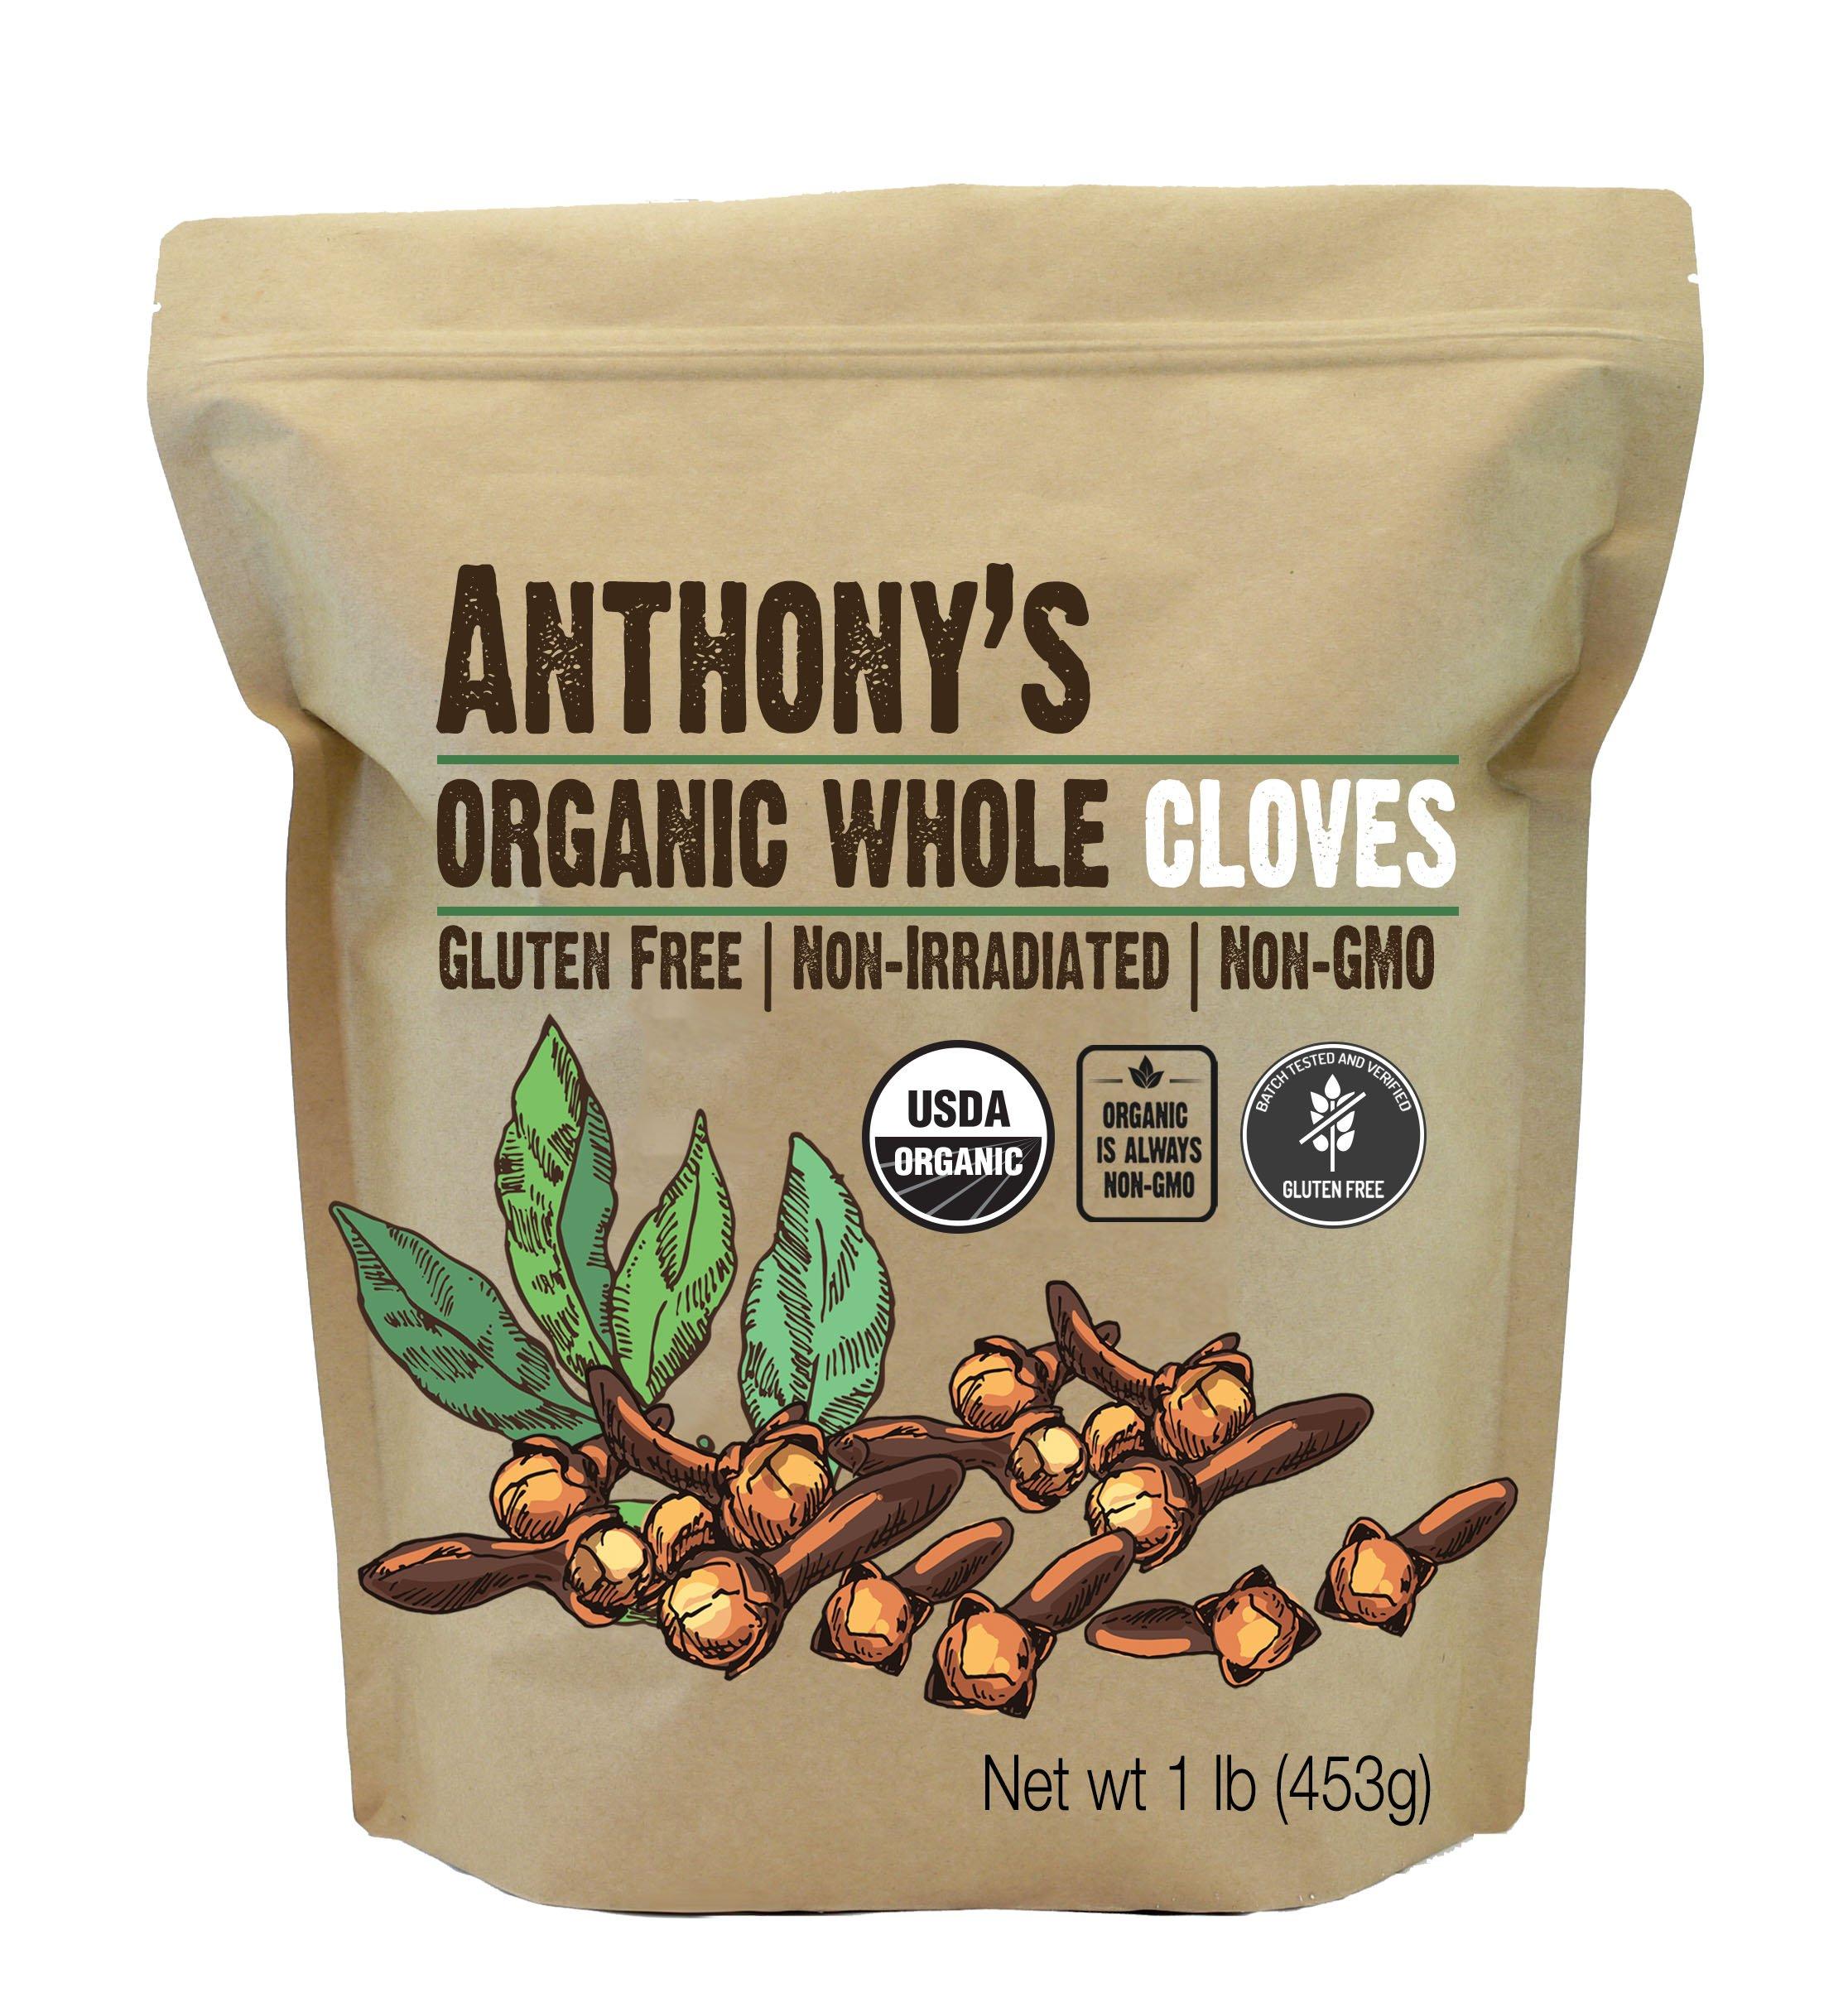 Anthony's Organic Whole Cloves (1lb), Gluten Free, Non-Irradiated, Non-GMO